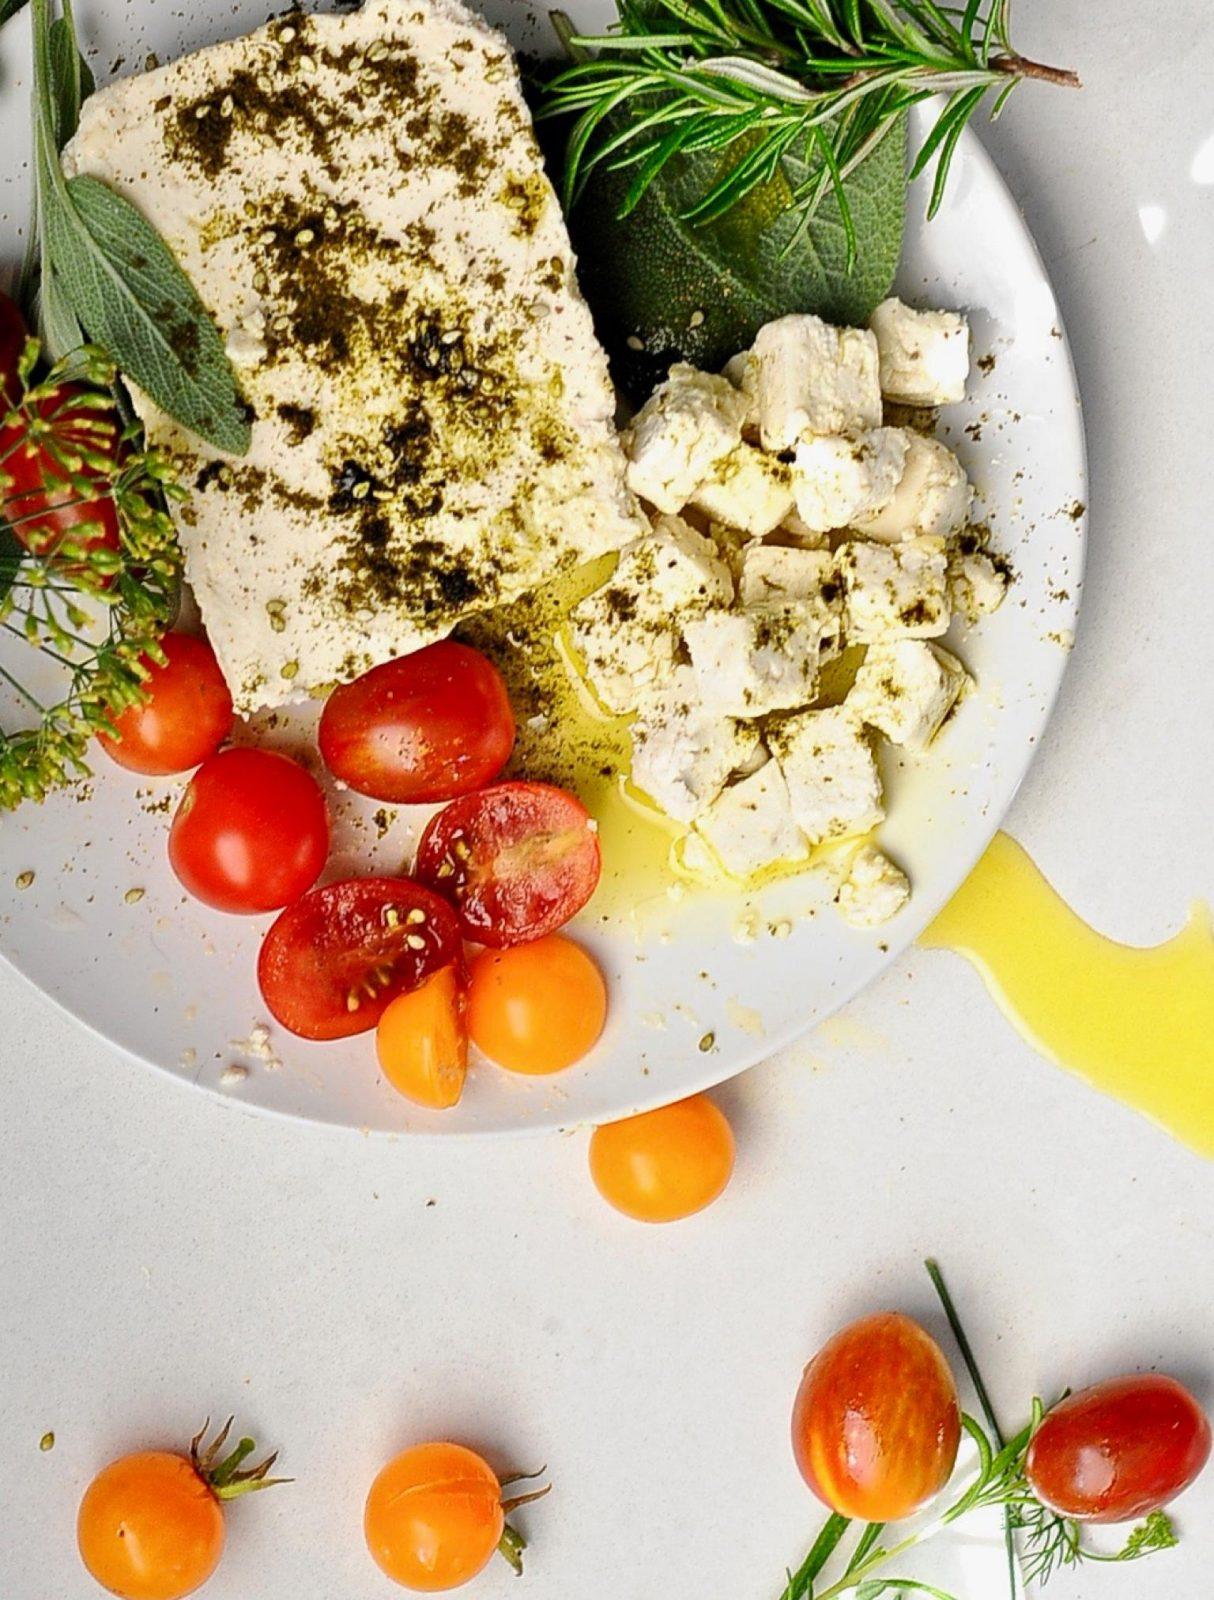 Vegan Feta Cheese Recipe, Almond Based